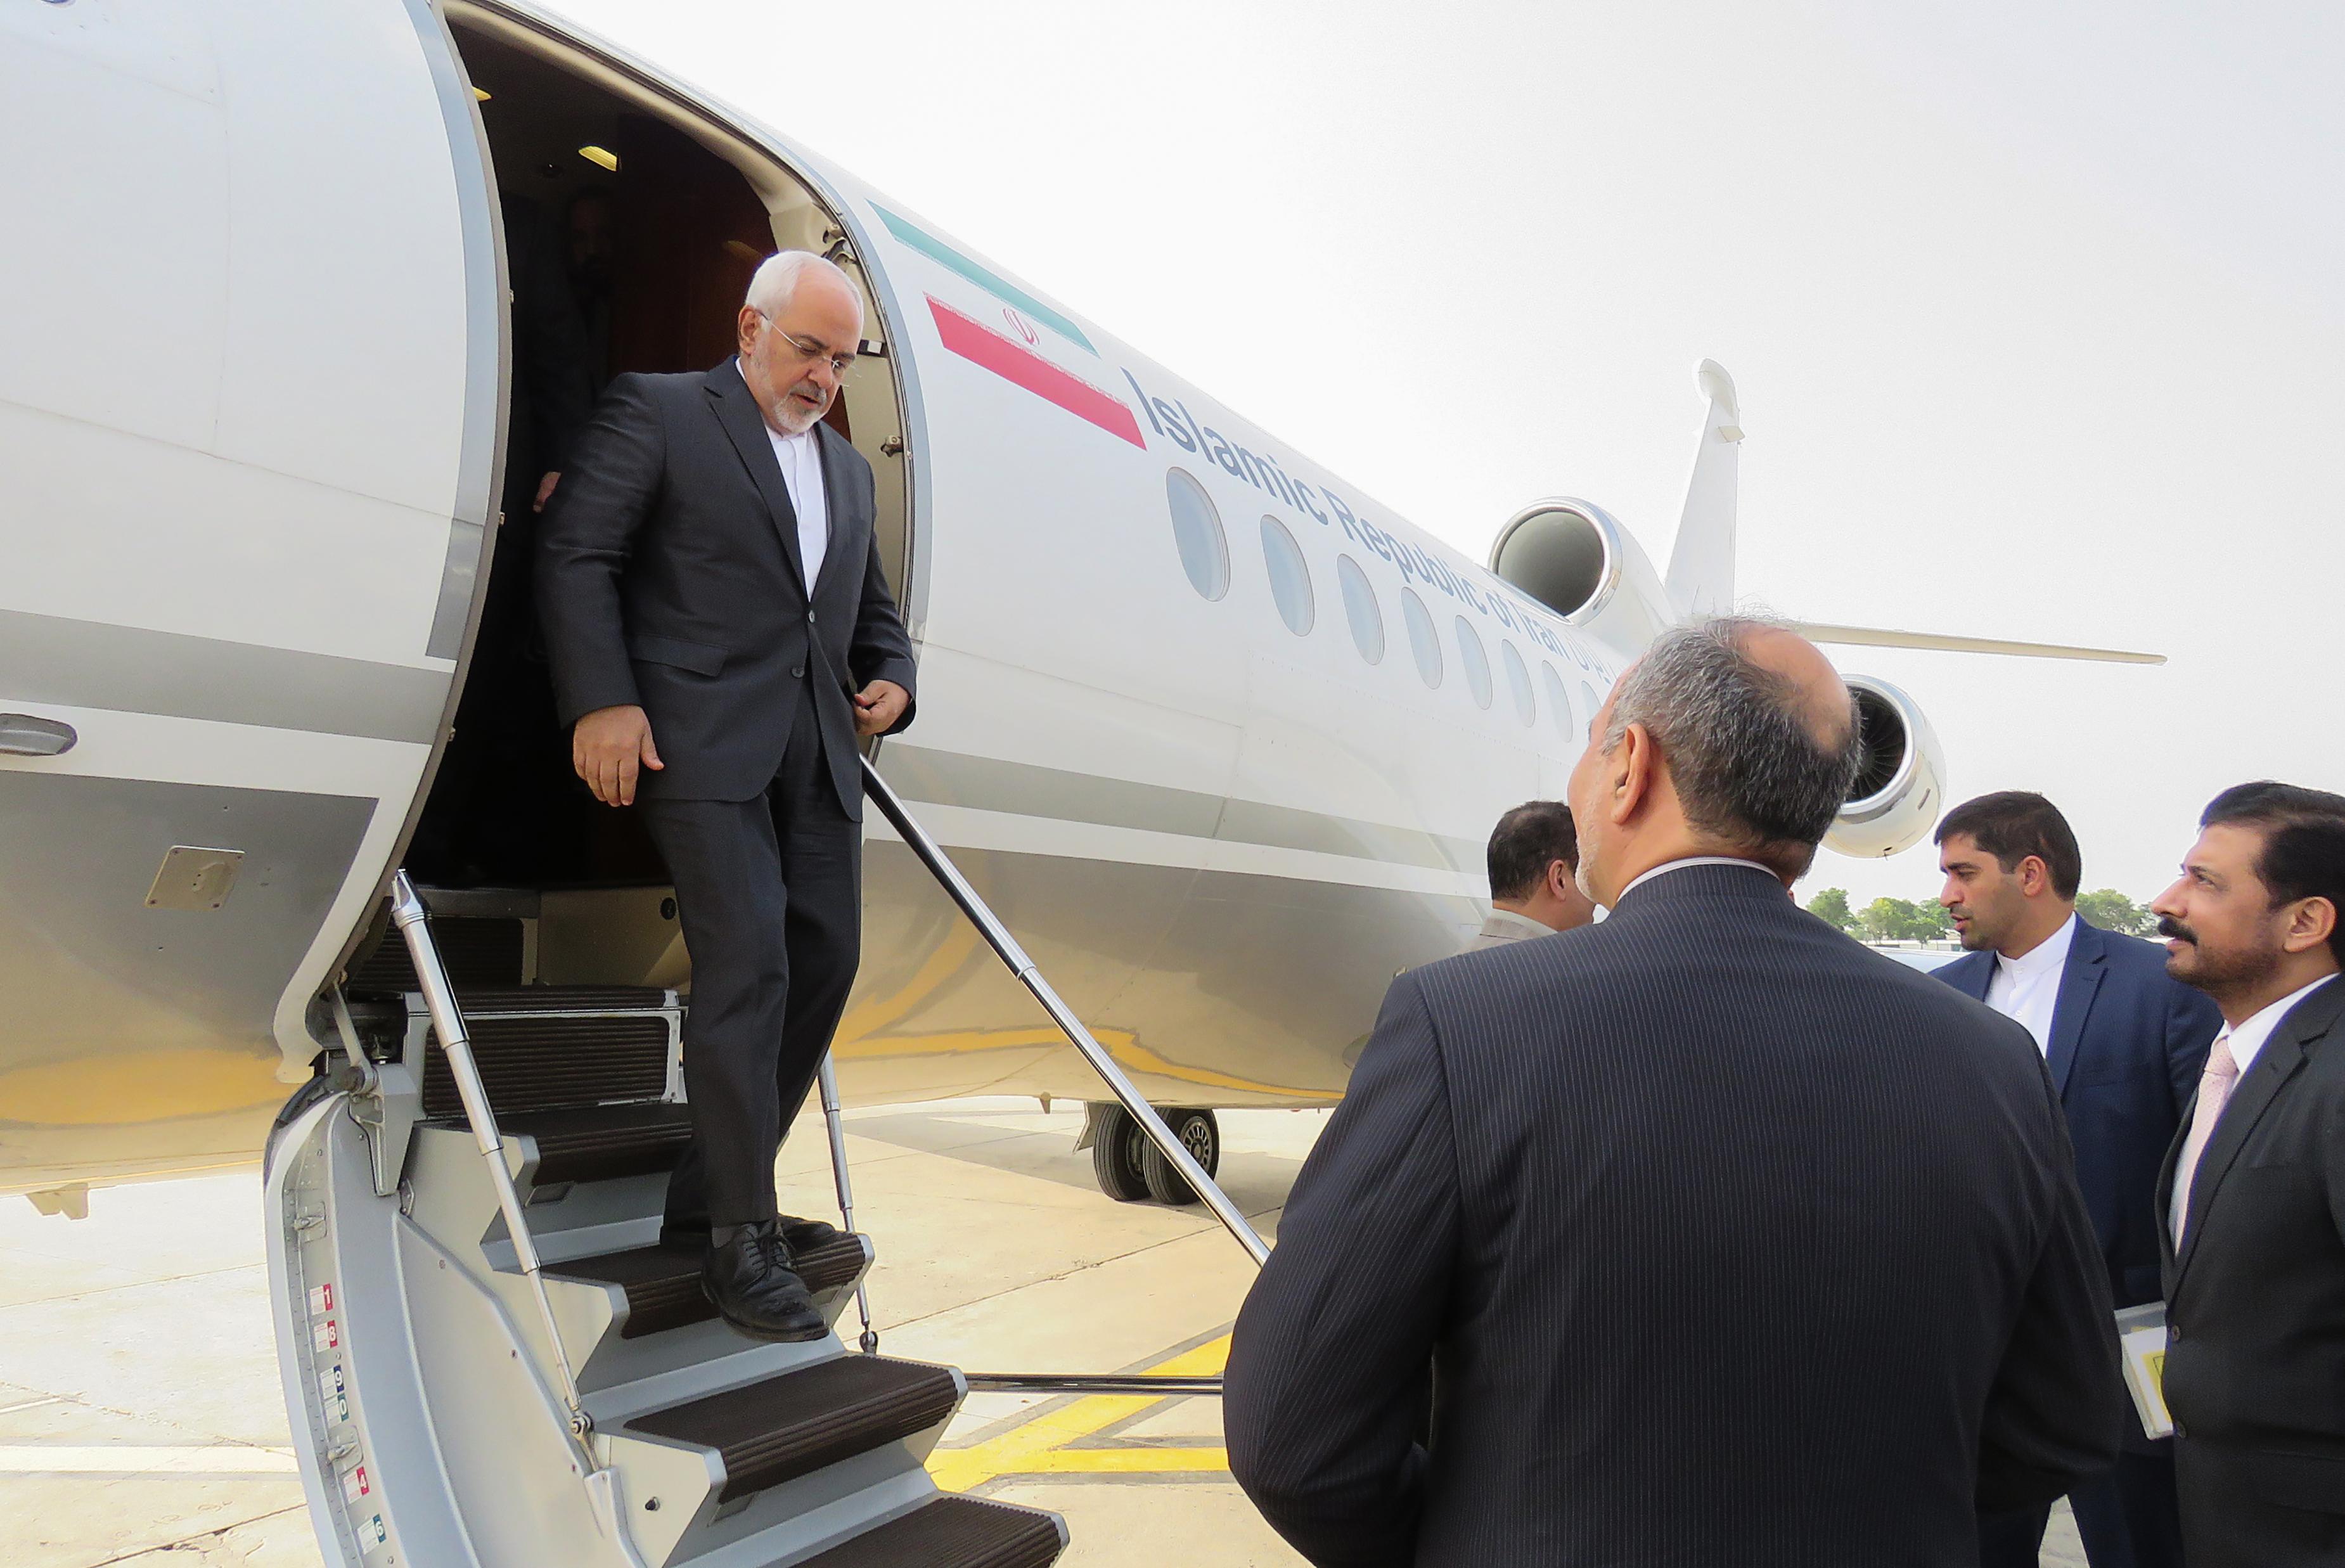 Iran fails to persuade Pakistan to back anti-US agenda: officials